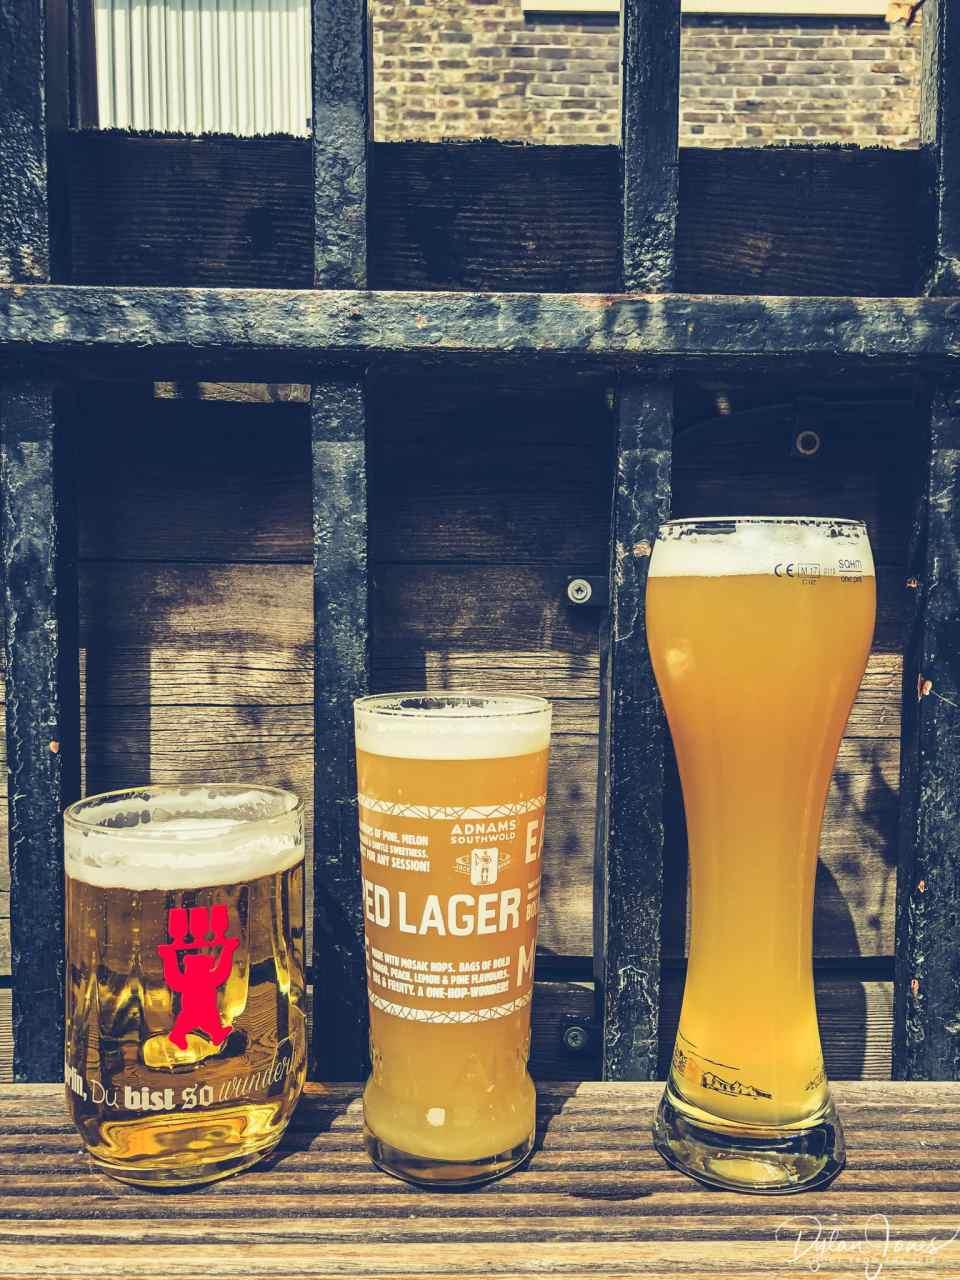 Sampling the beers at The Rake